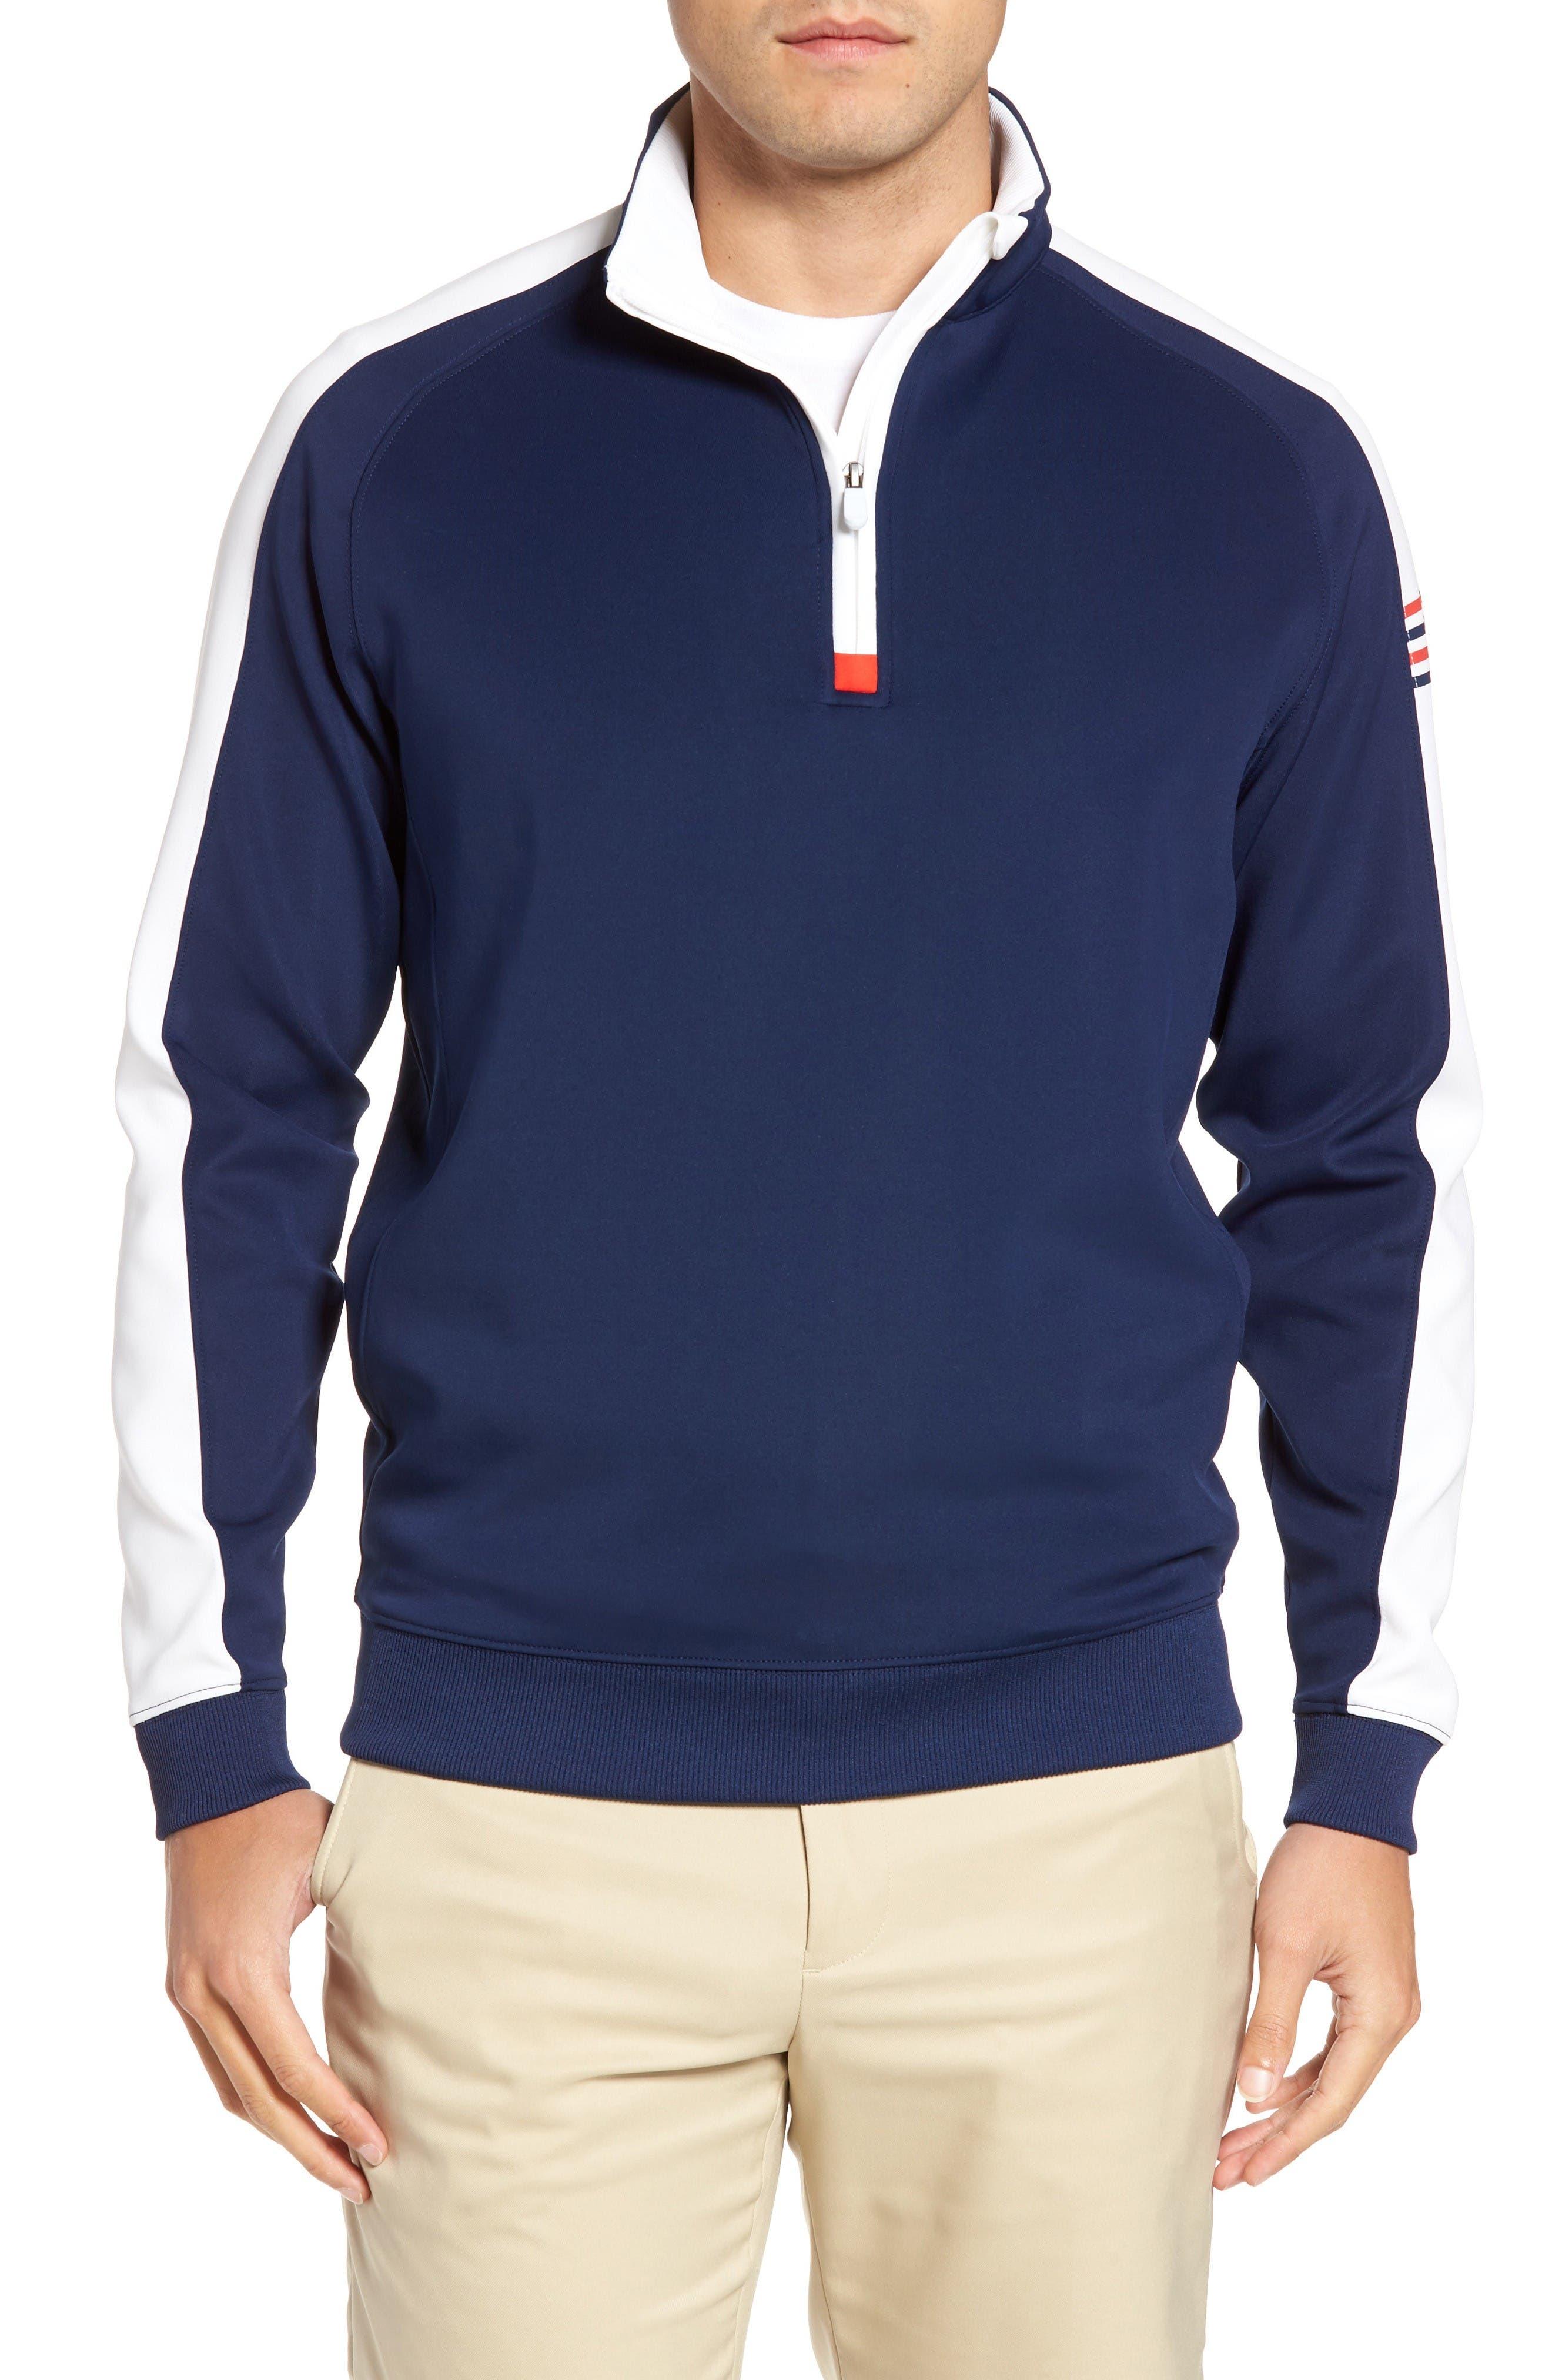 Main Image - Bobby Jones XH20 Tech Quarter Zip Sweater